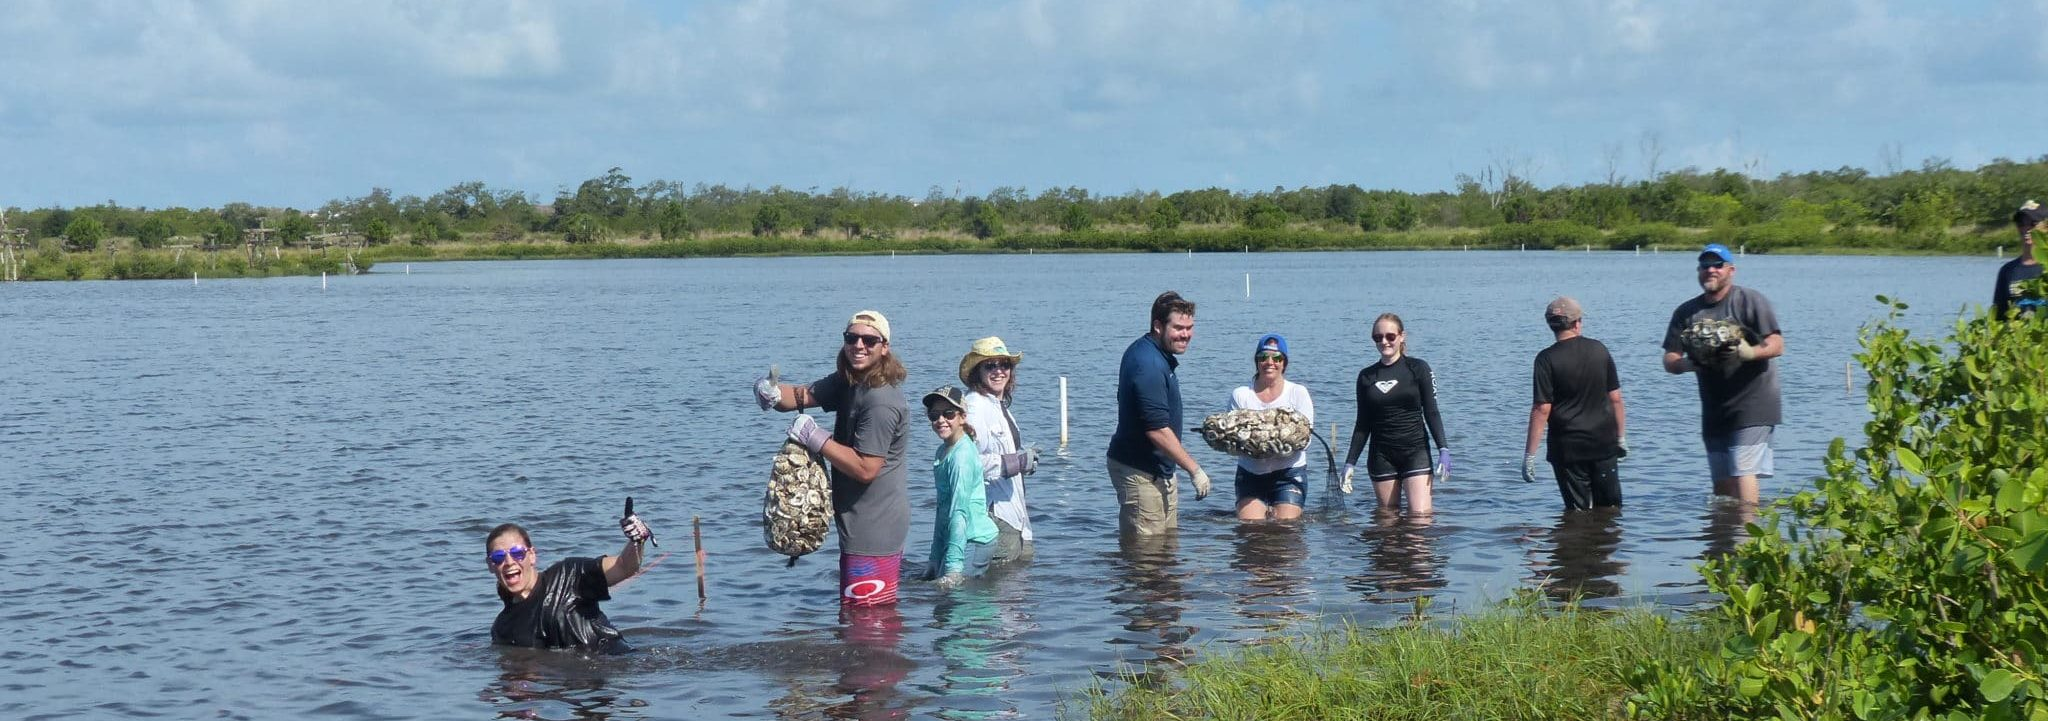 Volunteers in a line in water